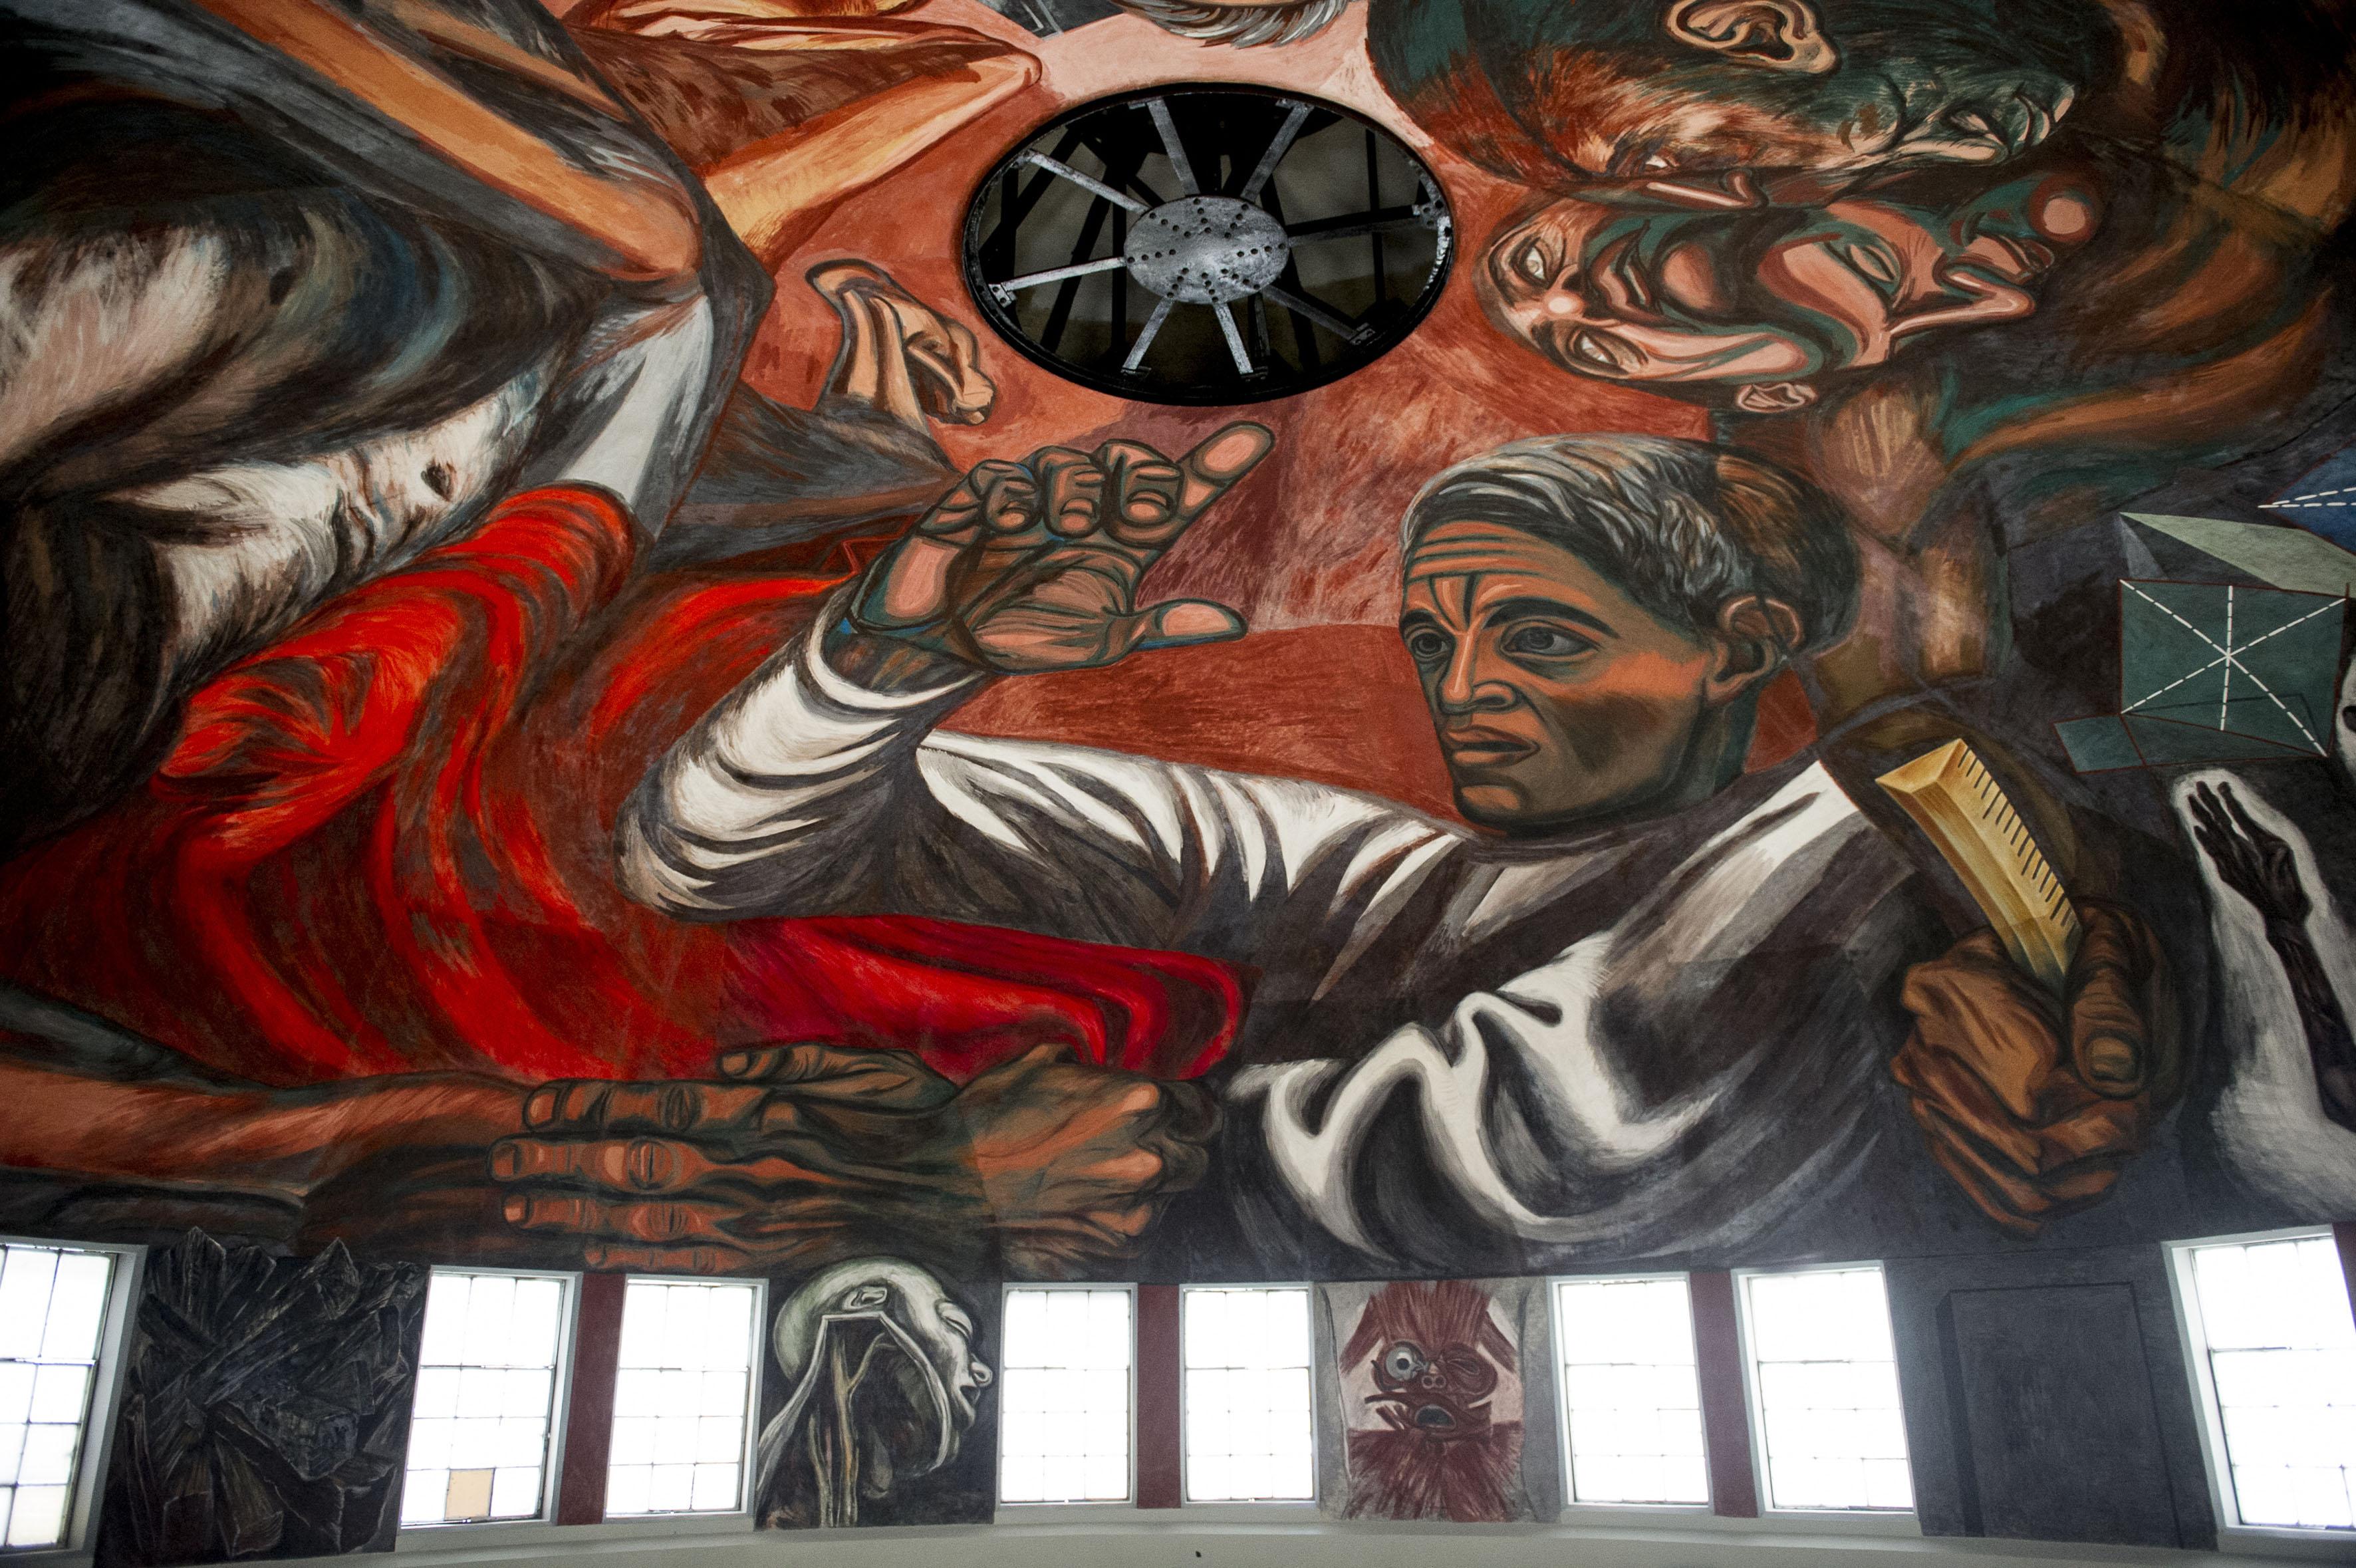 Concluye restauraci n de murales de orozco en paraninfo de for El mural guadalajara jalisco